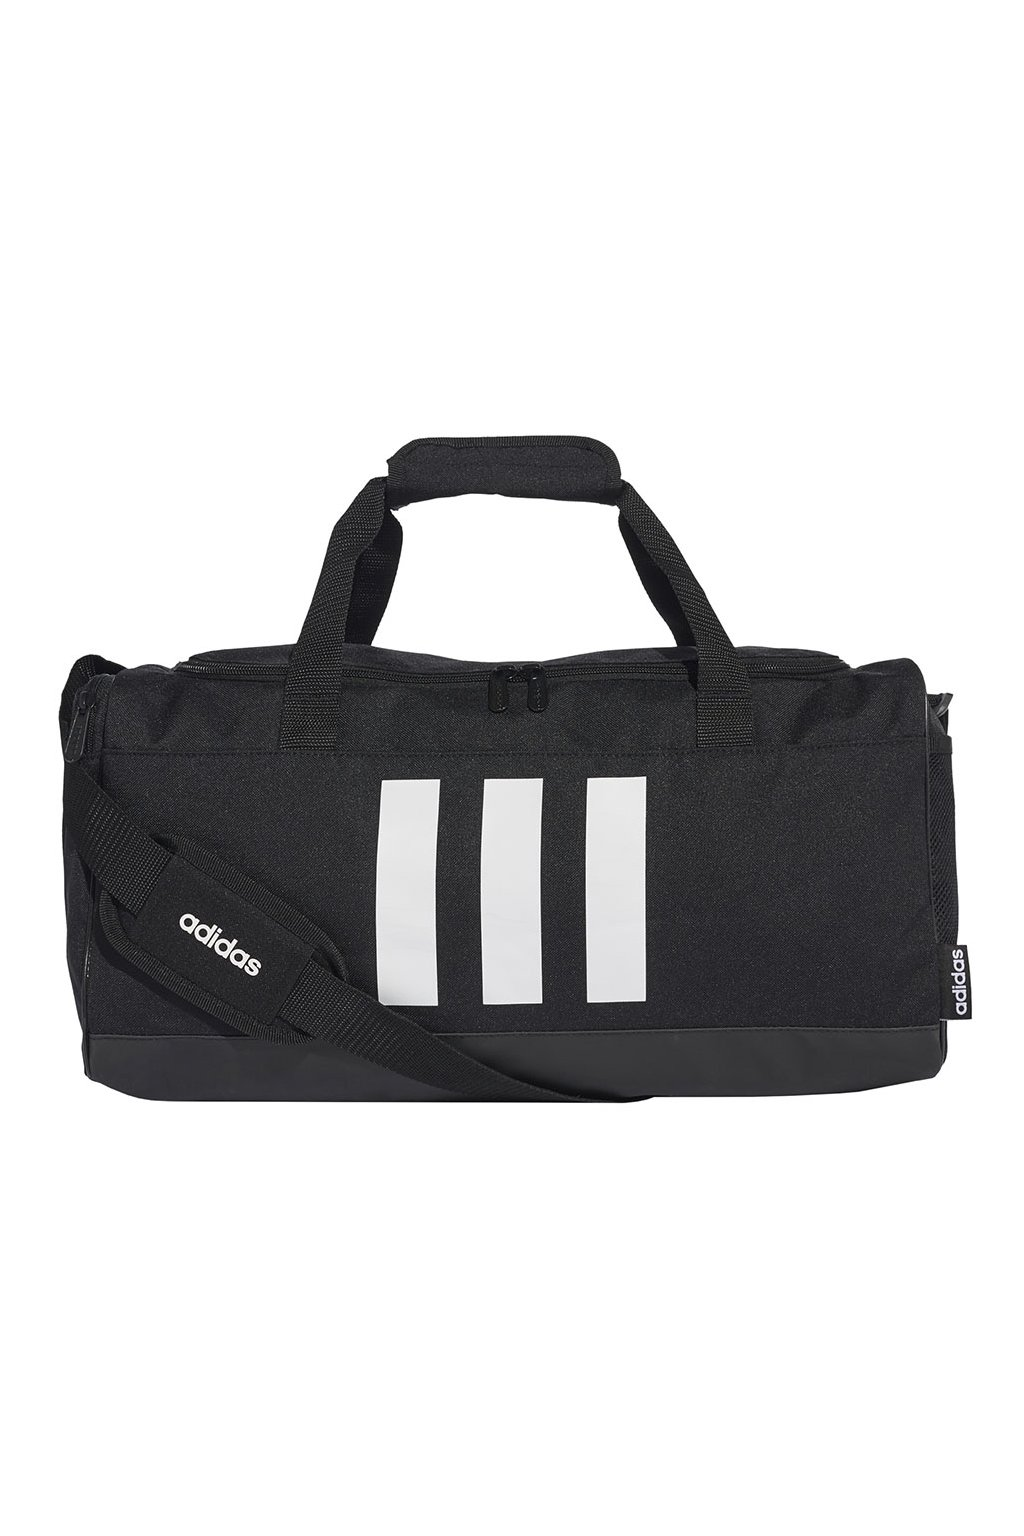 Taška Adidas 3 Stripes Duffel S čierna GE1237